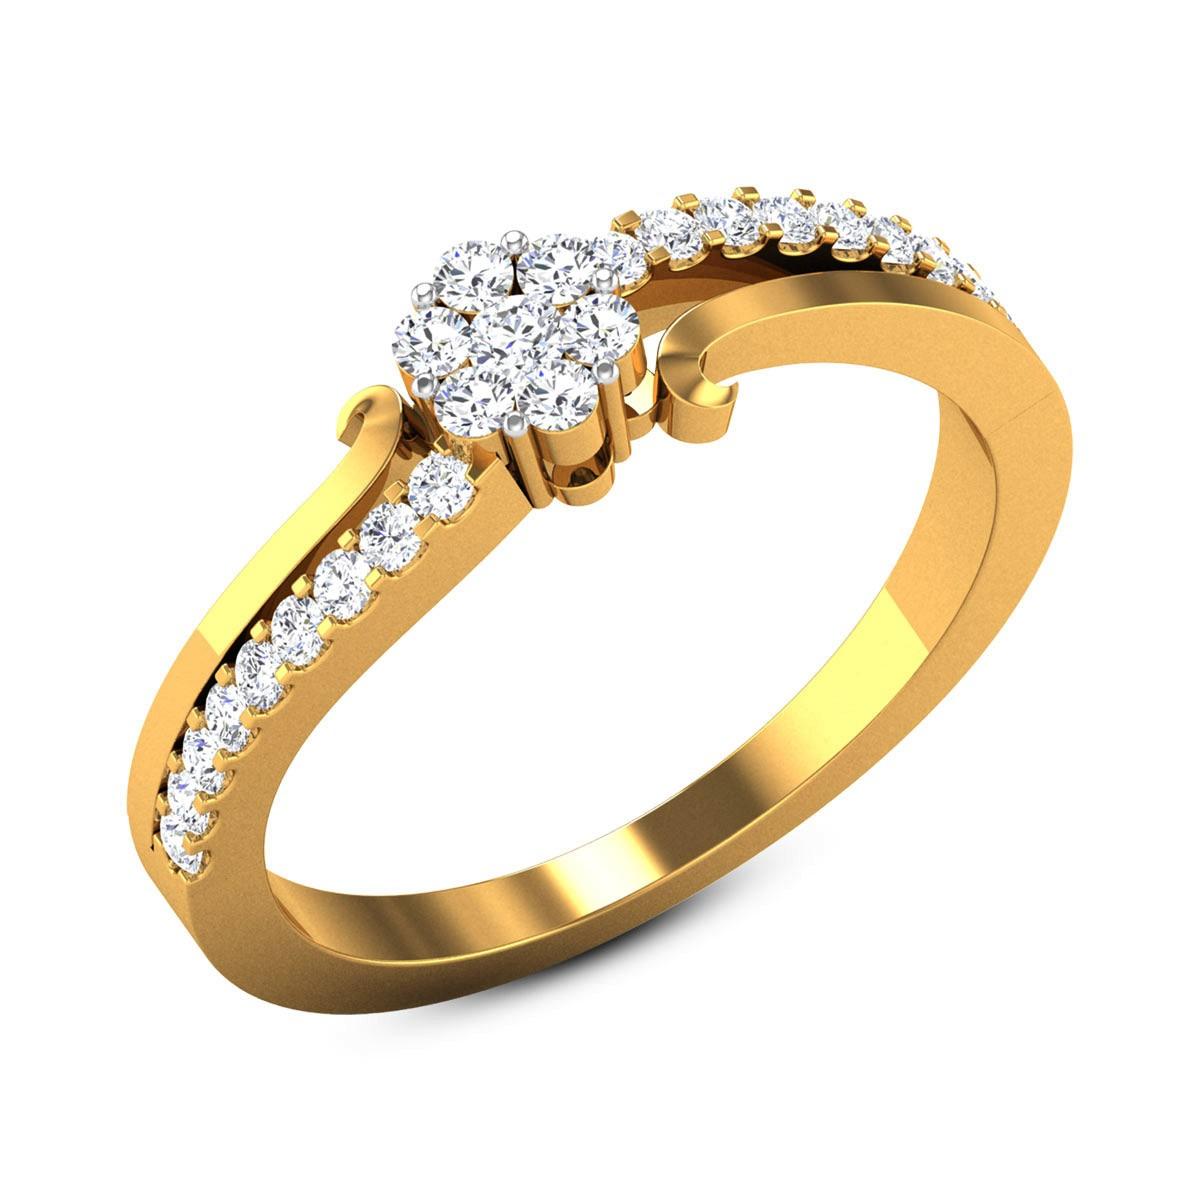 Kes Diamond Floral Ring